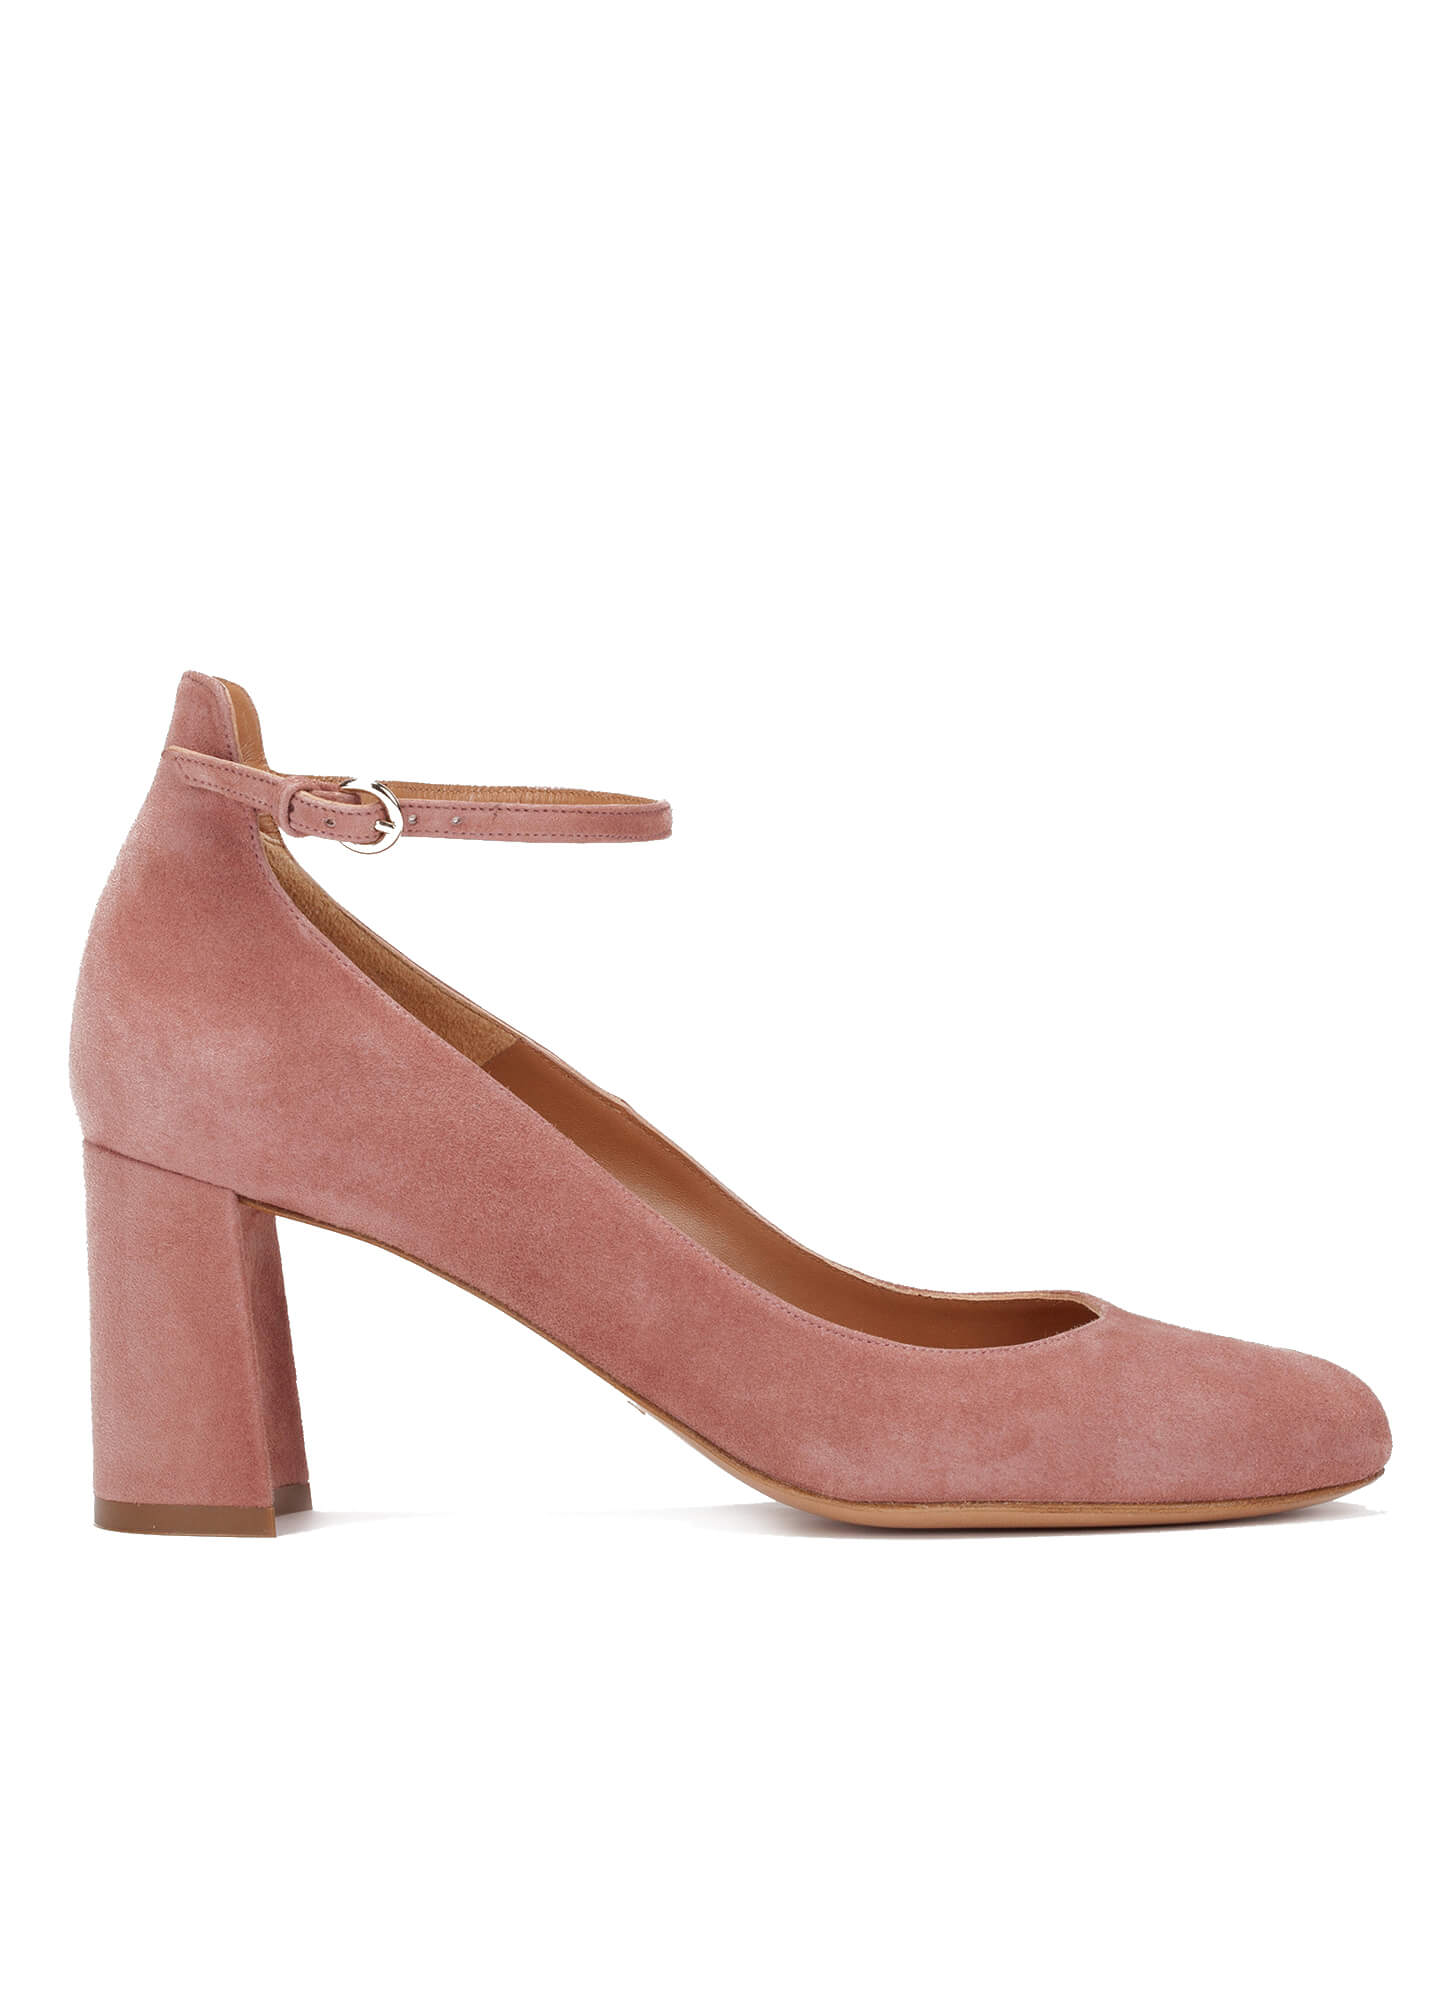 bc6d5074636b Mid heel shoes in pink suede - online shoe store Pura Lopez . PURA LOPEZ